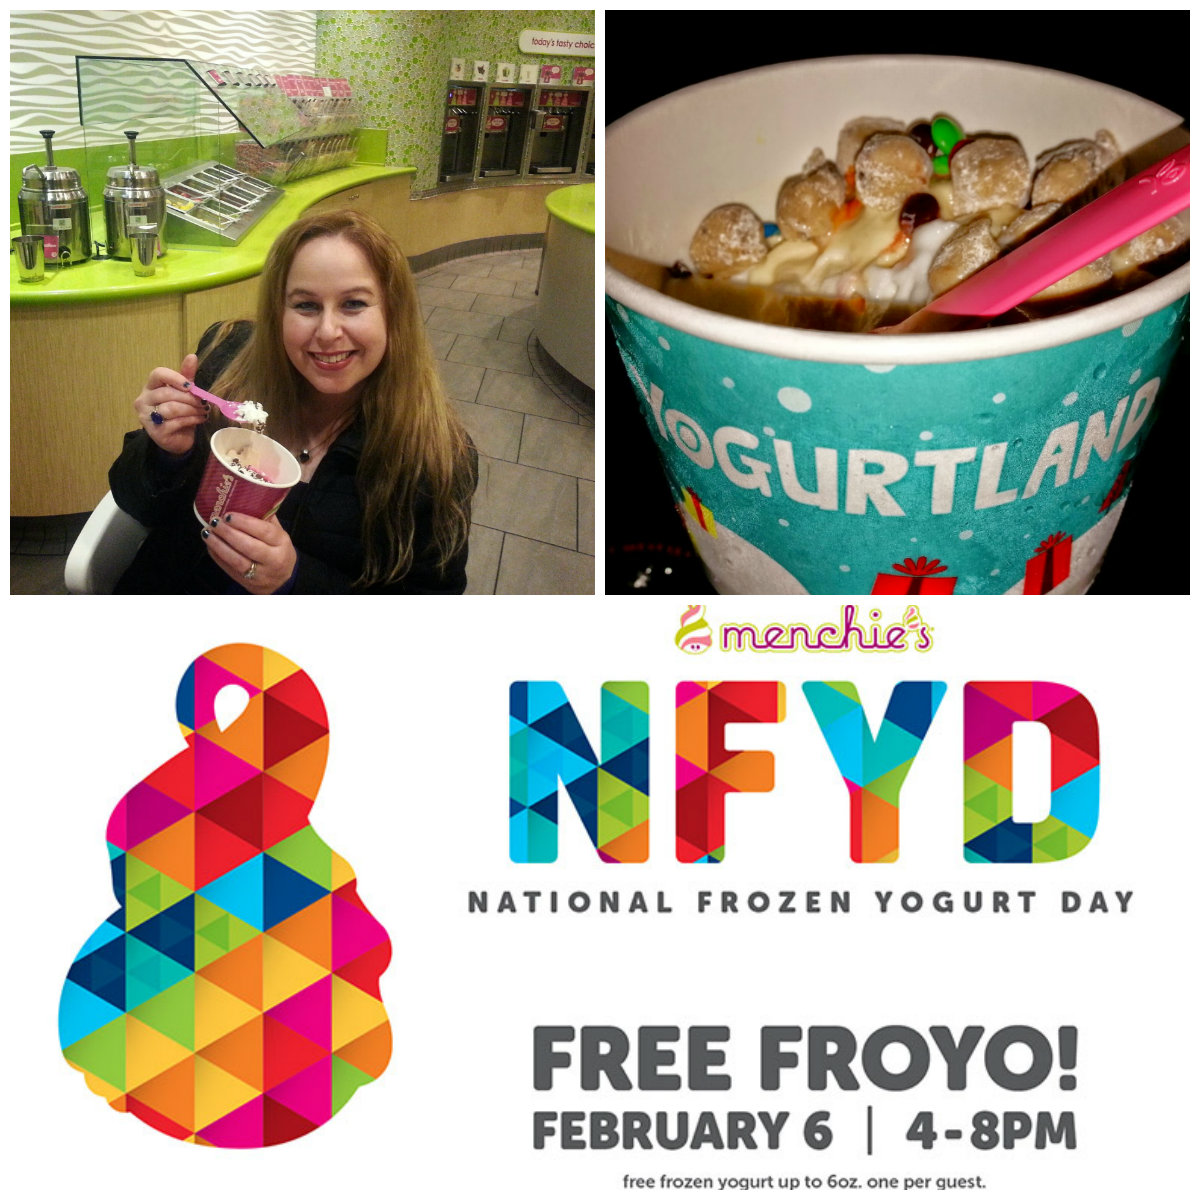 National frozen yogurt day free frozen yogurt, free frozen yogurt, menchies, yogurtland